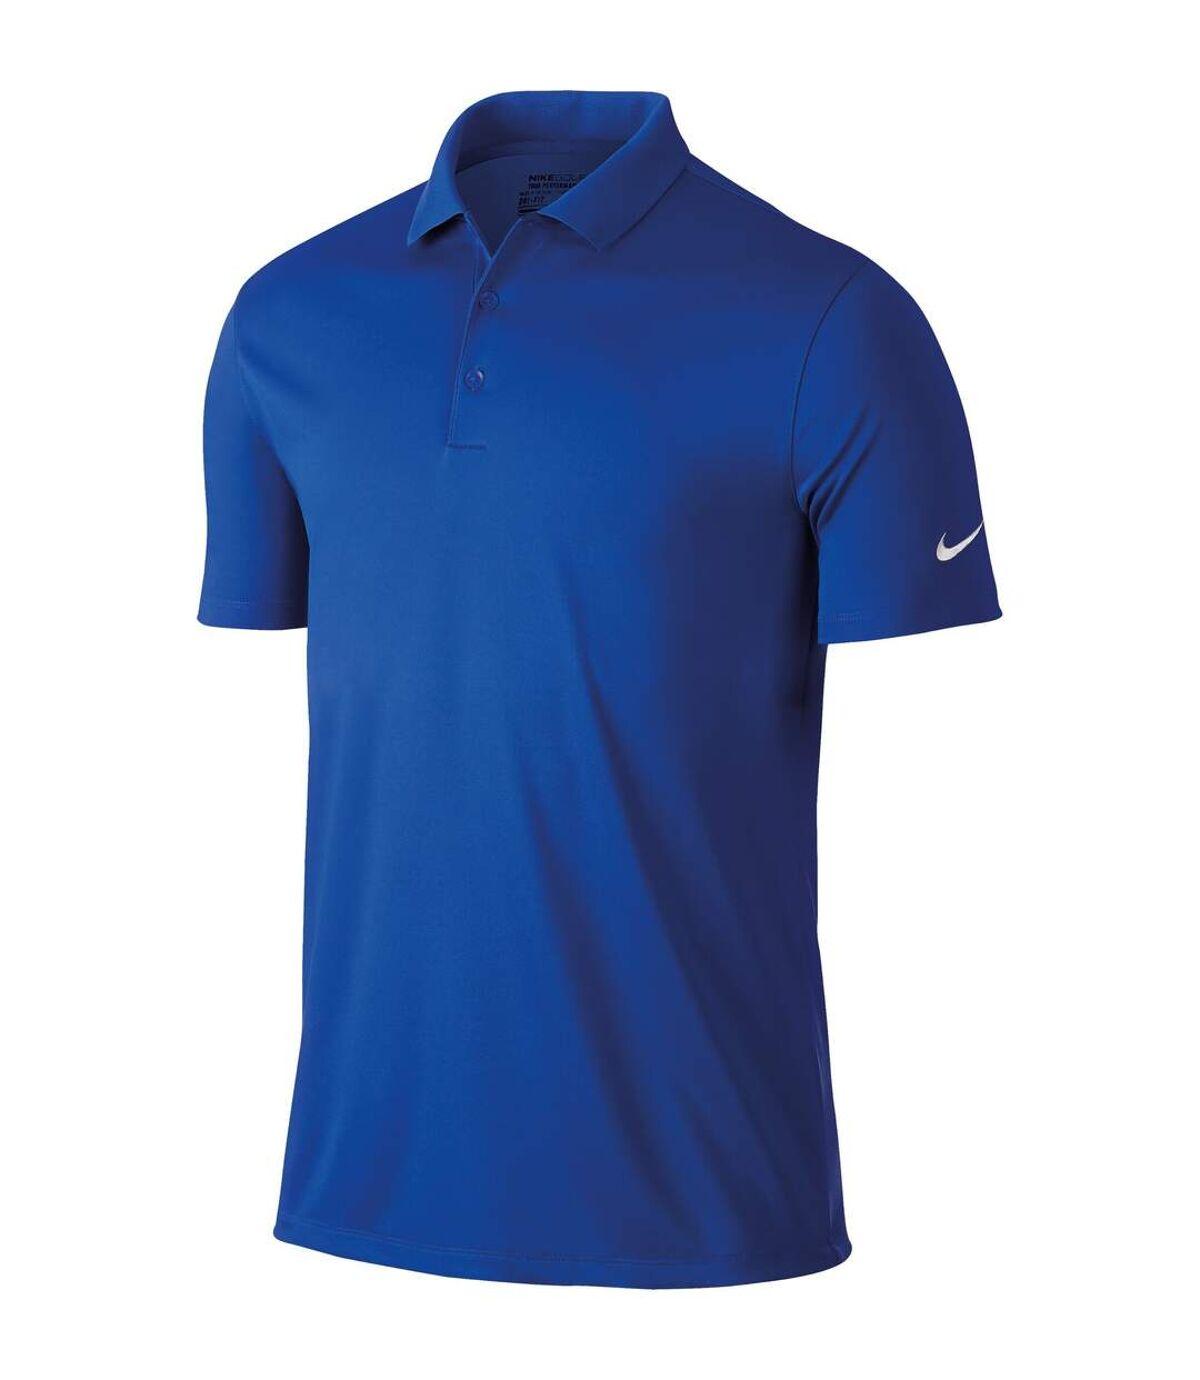 Nike Victory - Polo sport à manches courtes - Homme (Bleu roi) - UTRW3930